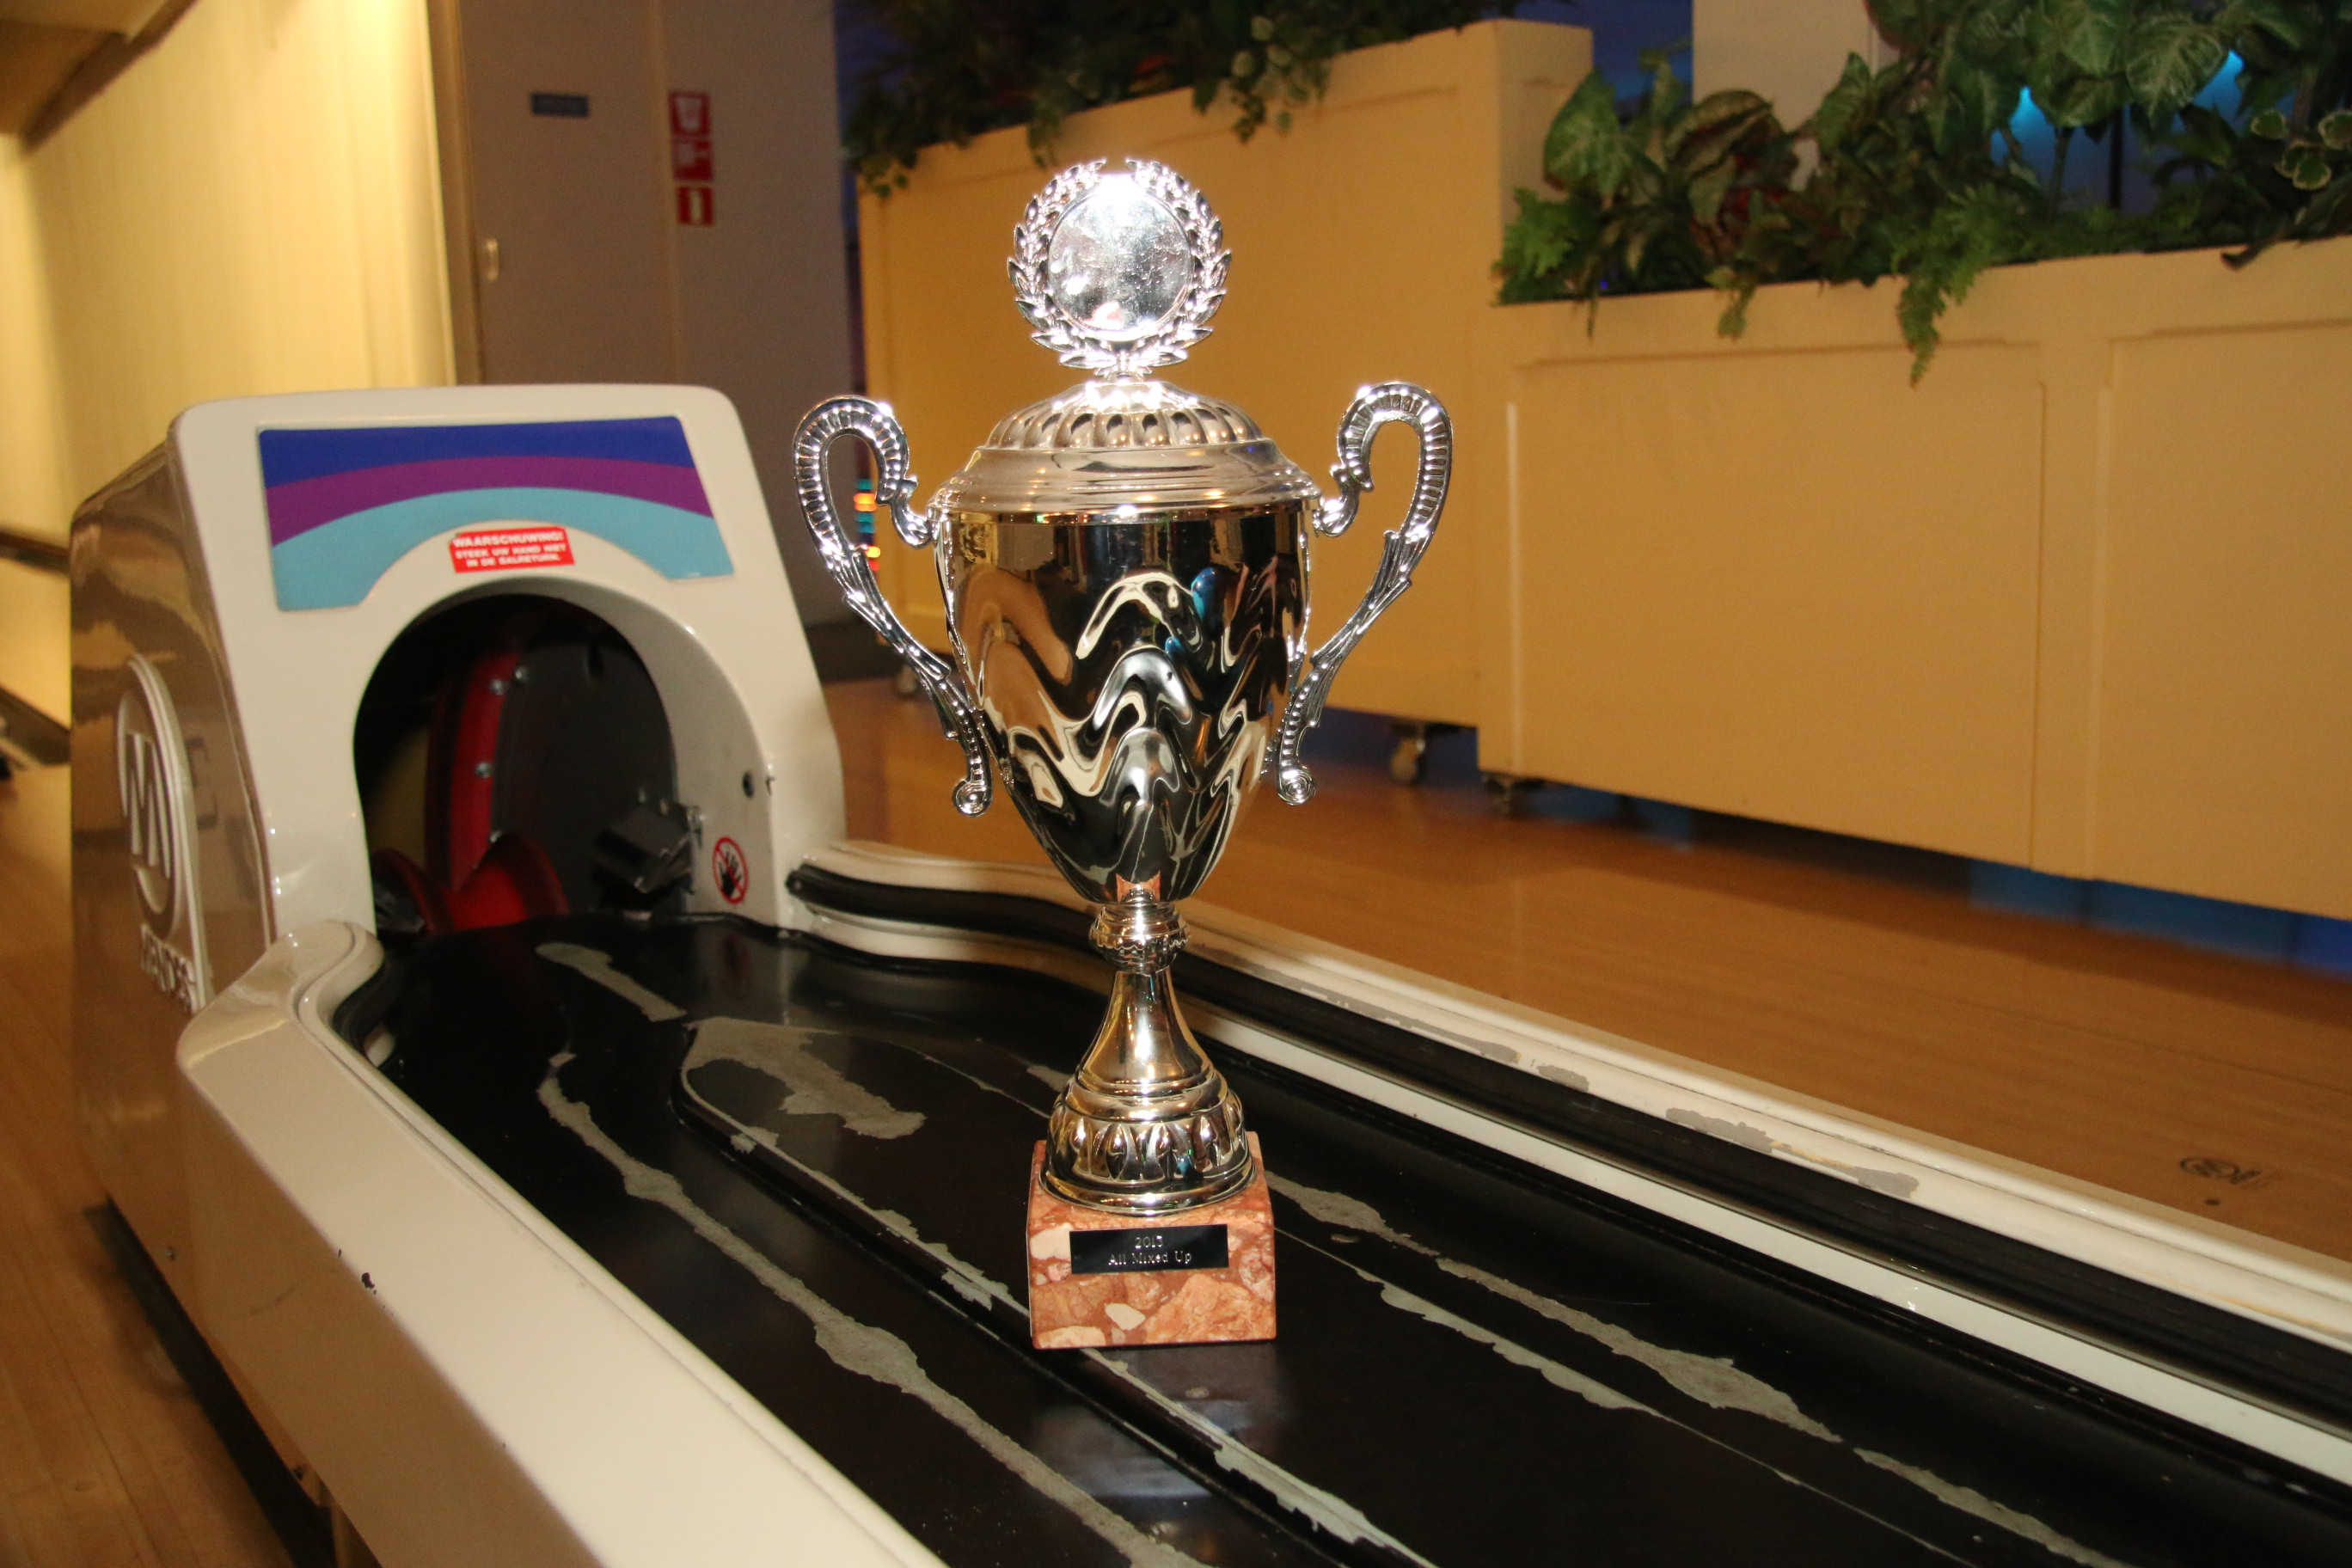 http://www.bowlingverenigingheiloo.nl/fotos_verhalen/foto's/2016_0526-De Wisselbeker.jpg